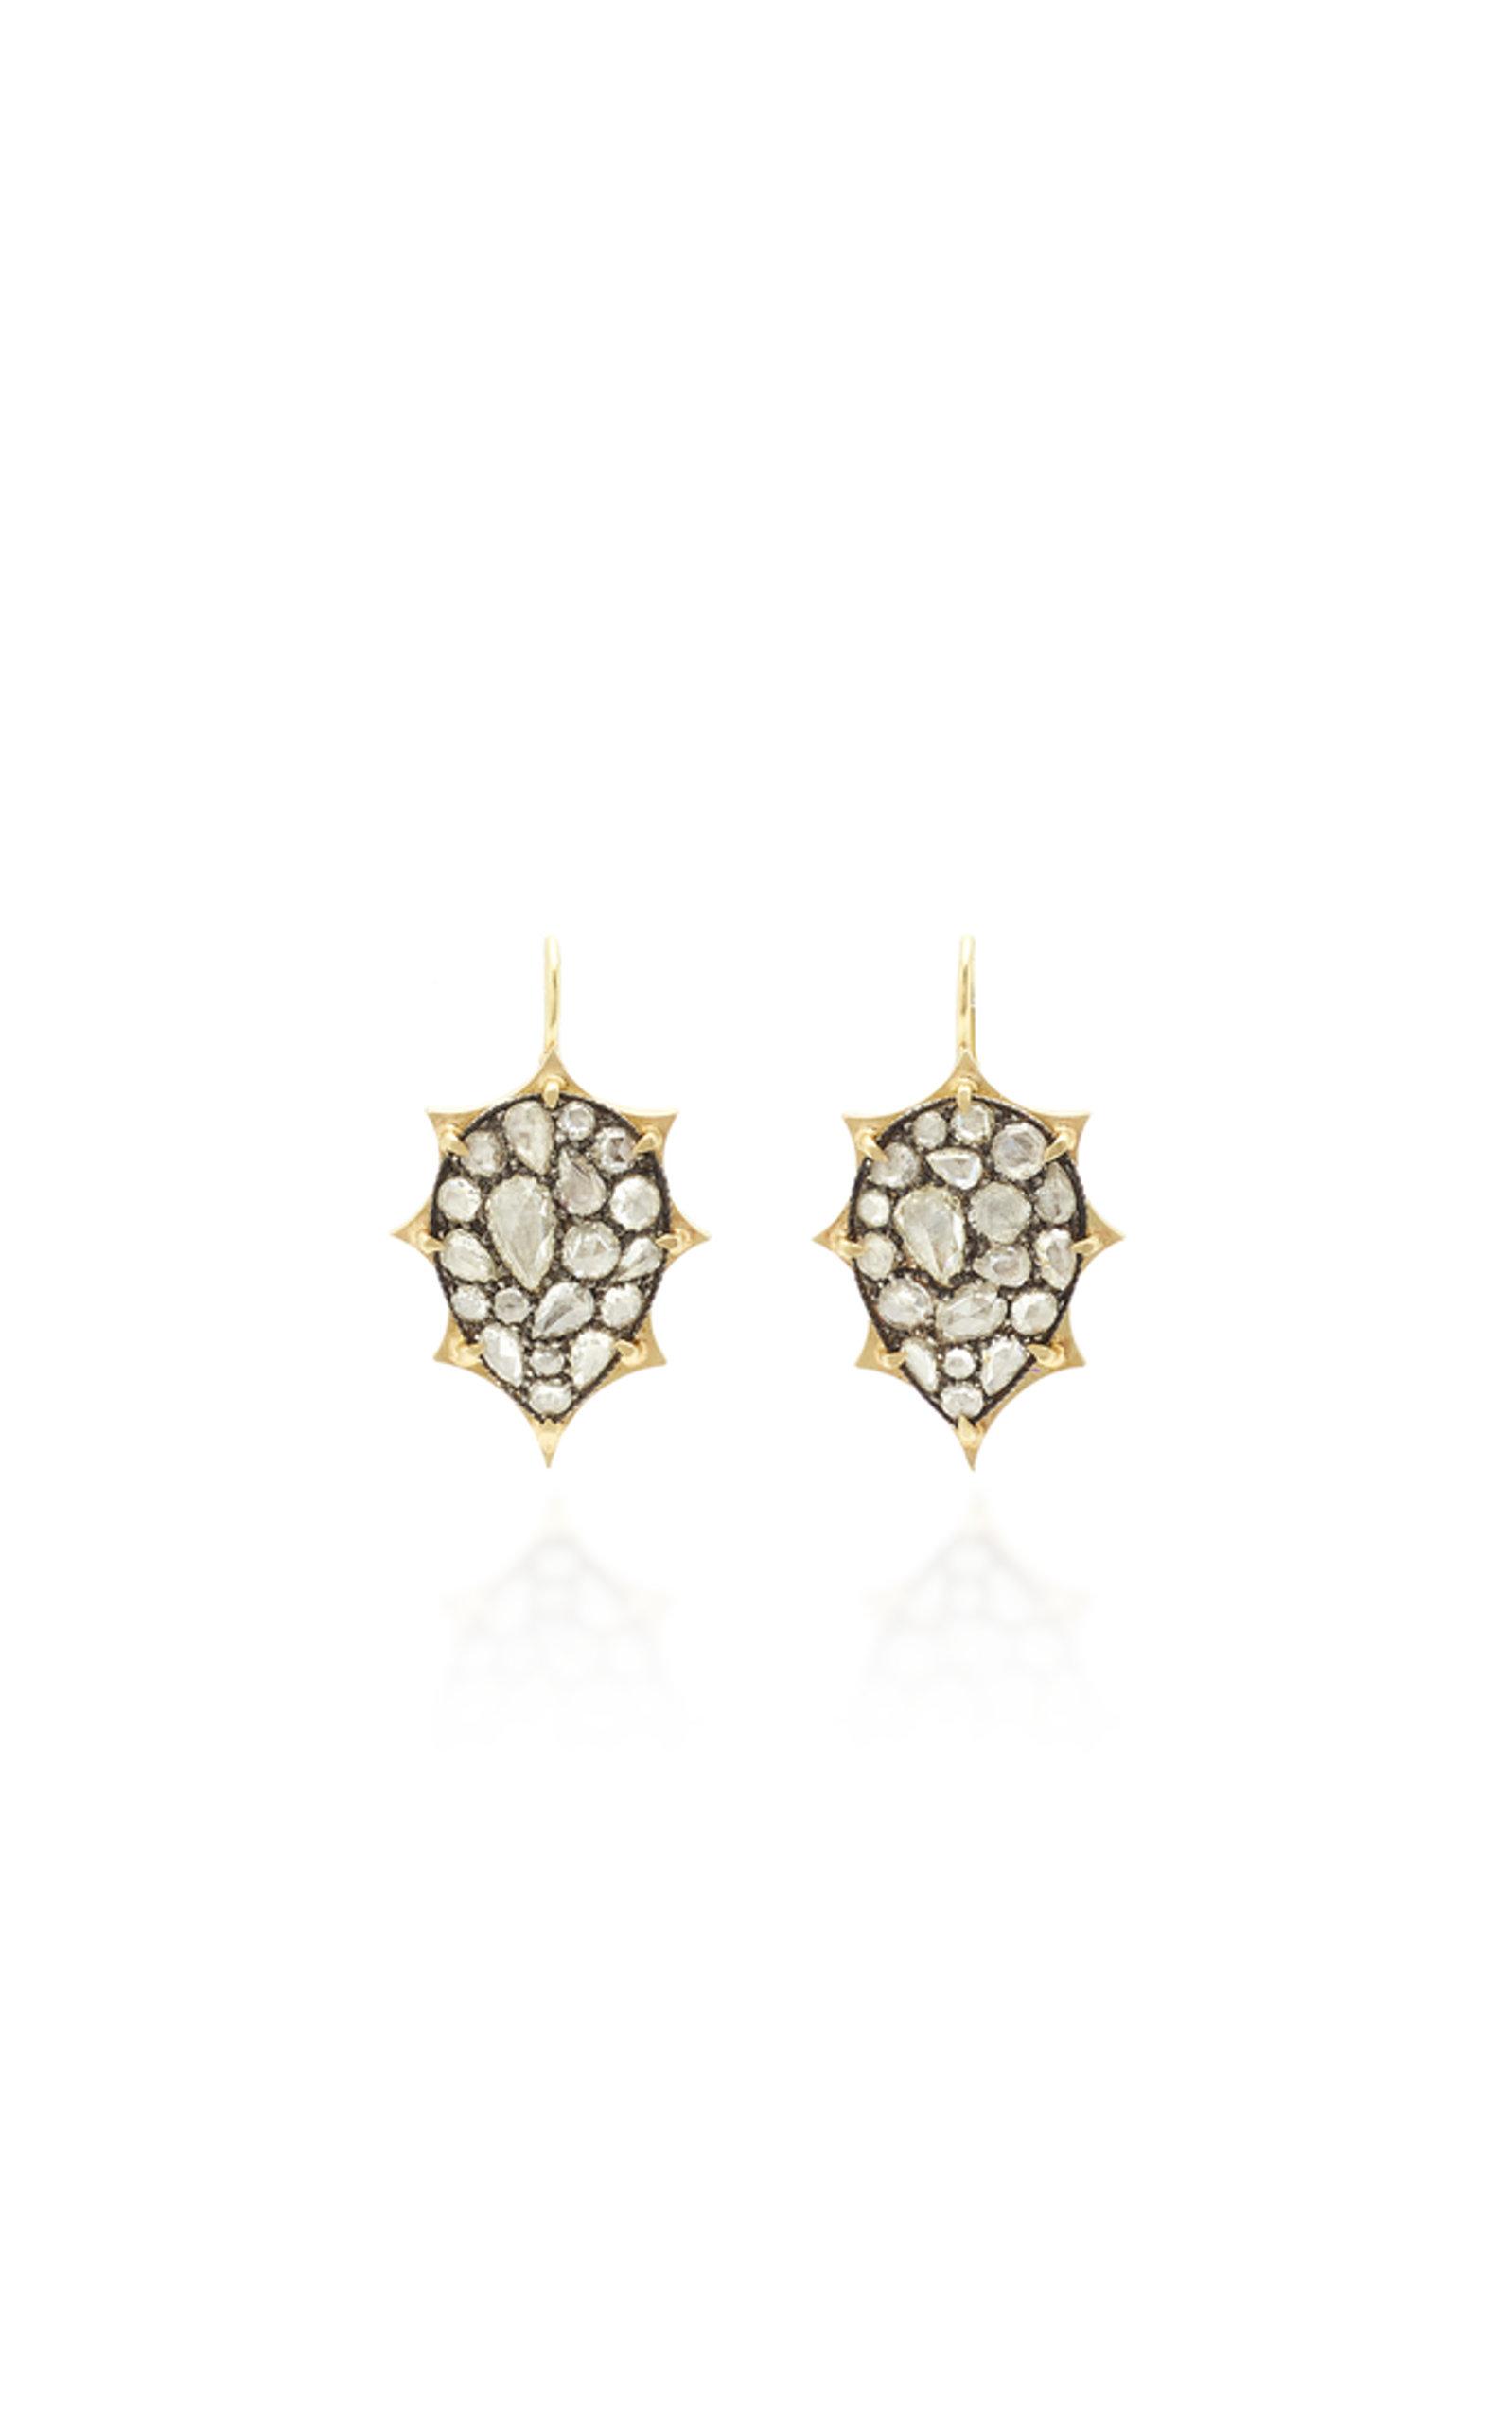 SYLVA & CIE 18K YELLOW GOLD WHITE ROSE CUT DIAMOND EARRINGS